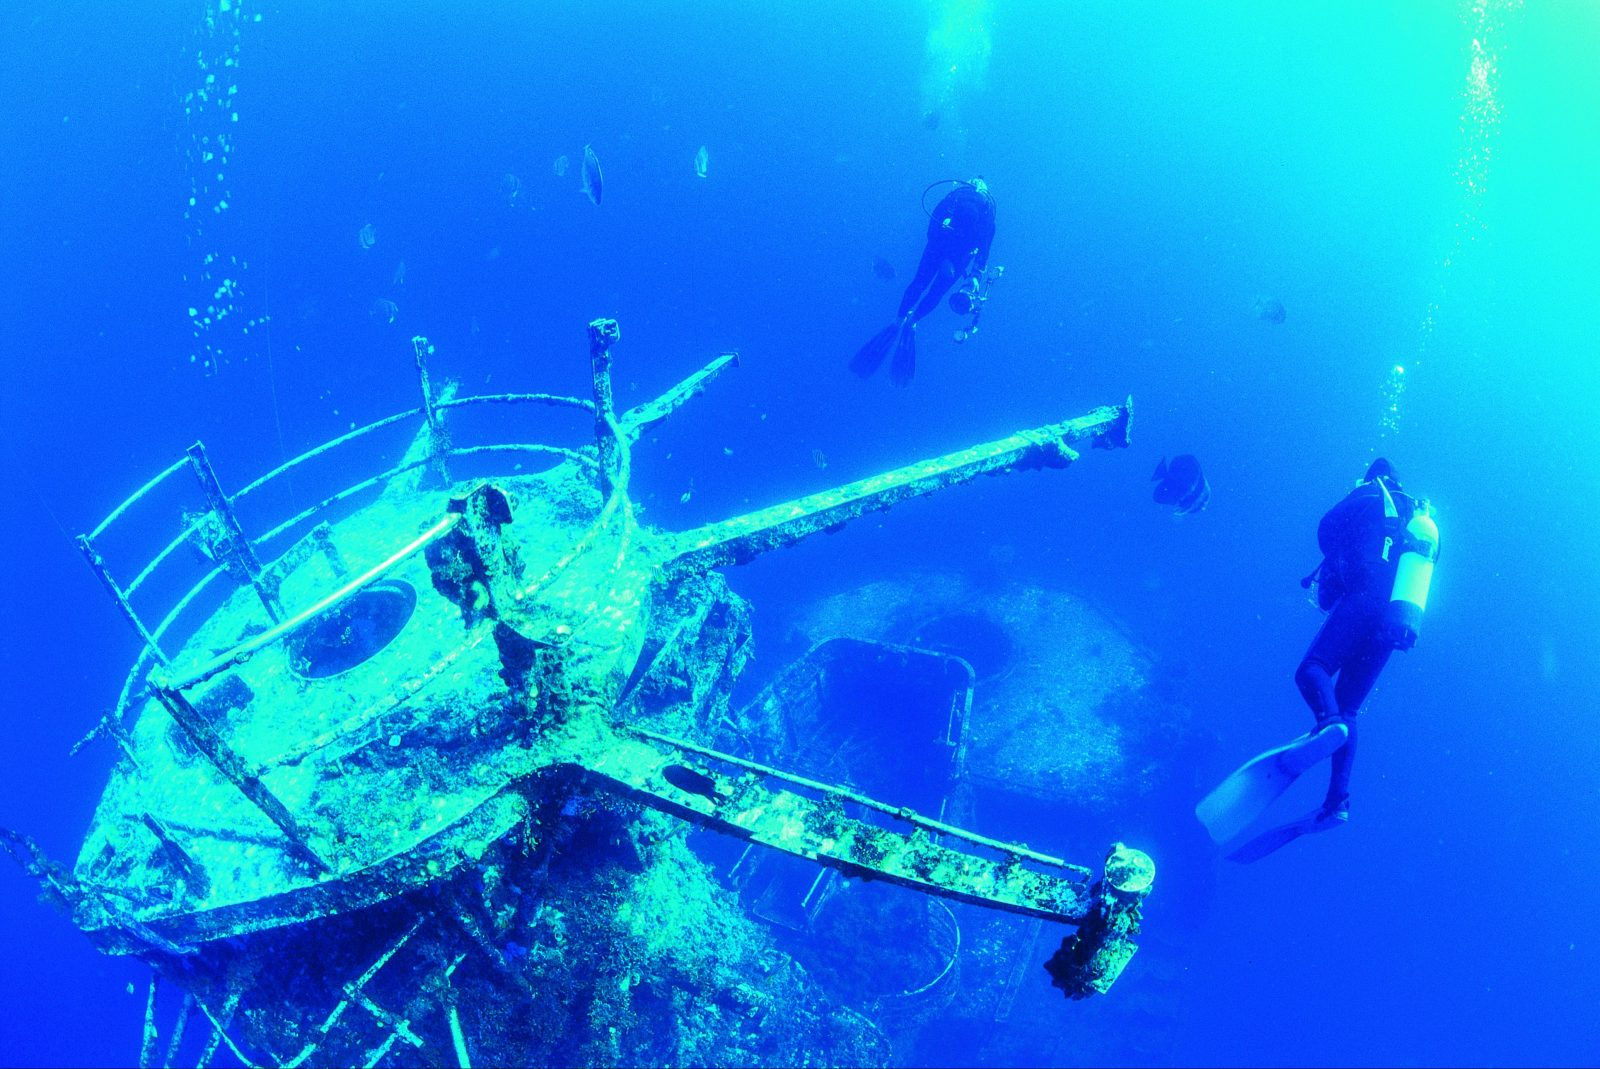 Swan Dive Wreck, Dunsborough, Western Australia